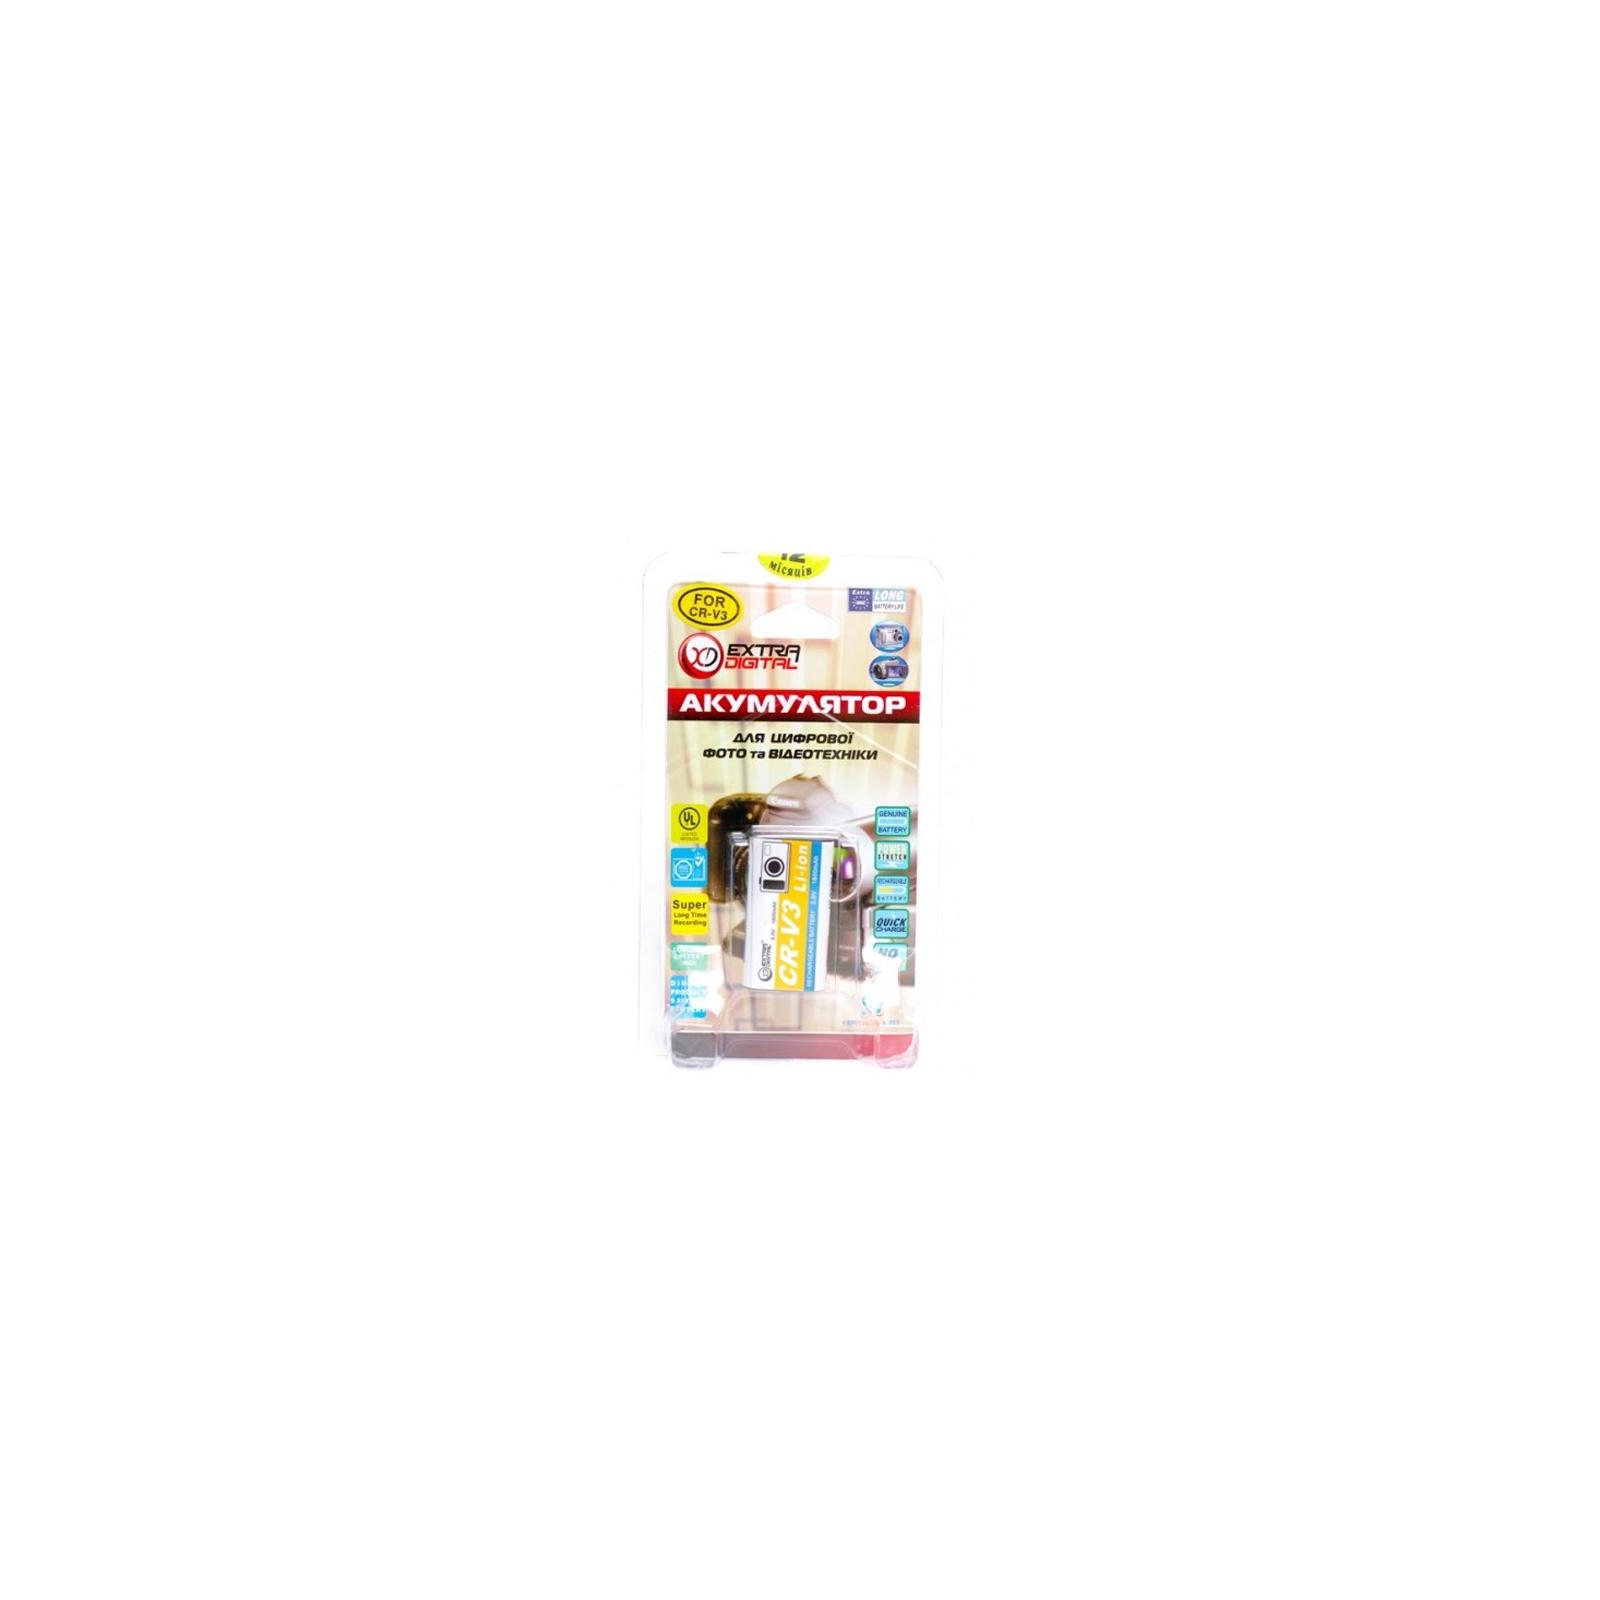 Аккумулятор к фото/видео EXTRADIGITAL Olympus LI-O1B (DV00DV1072) изображение 3